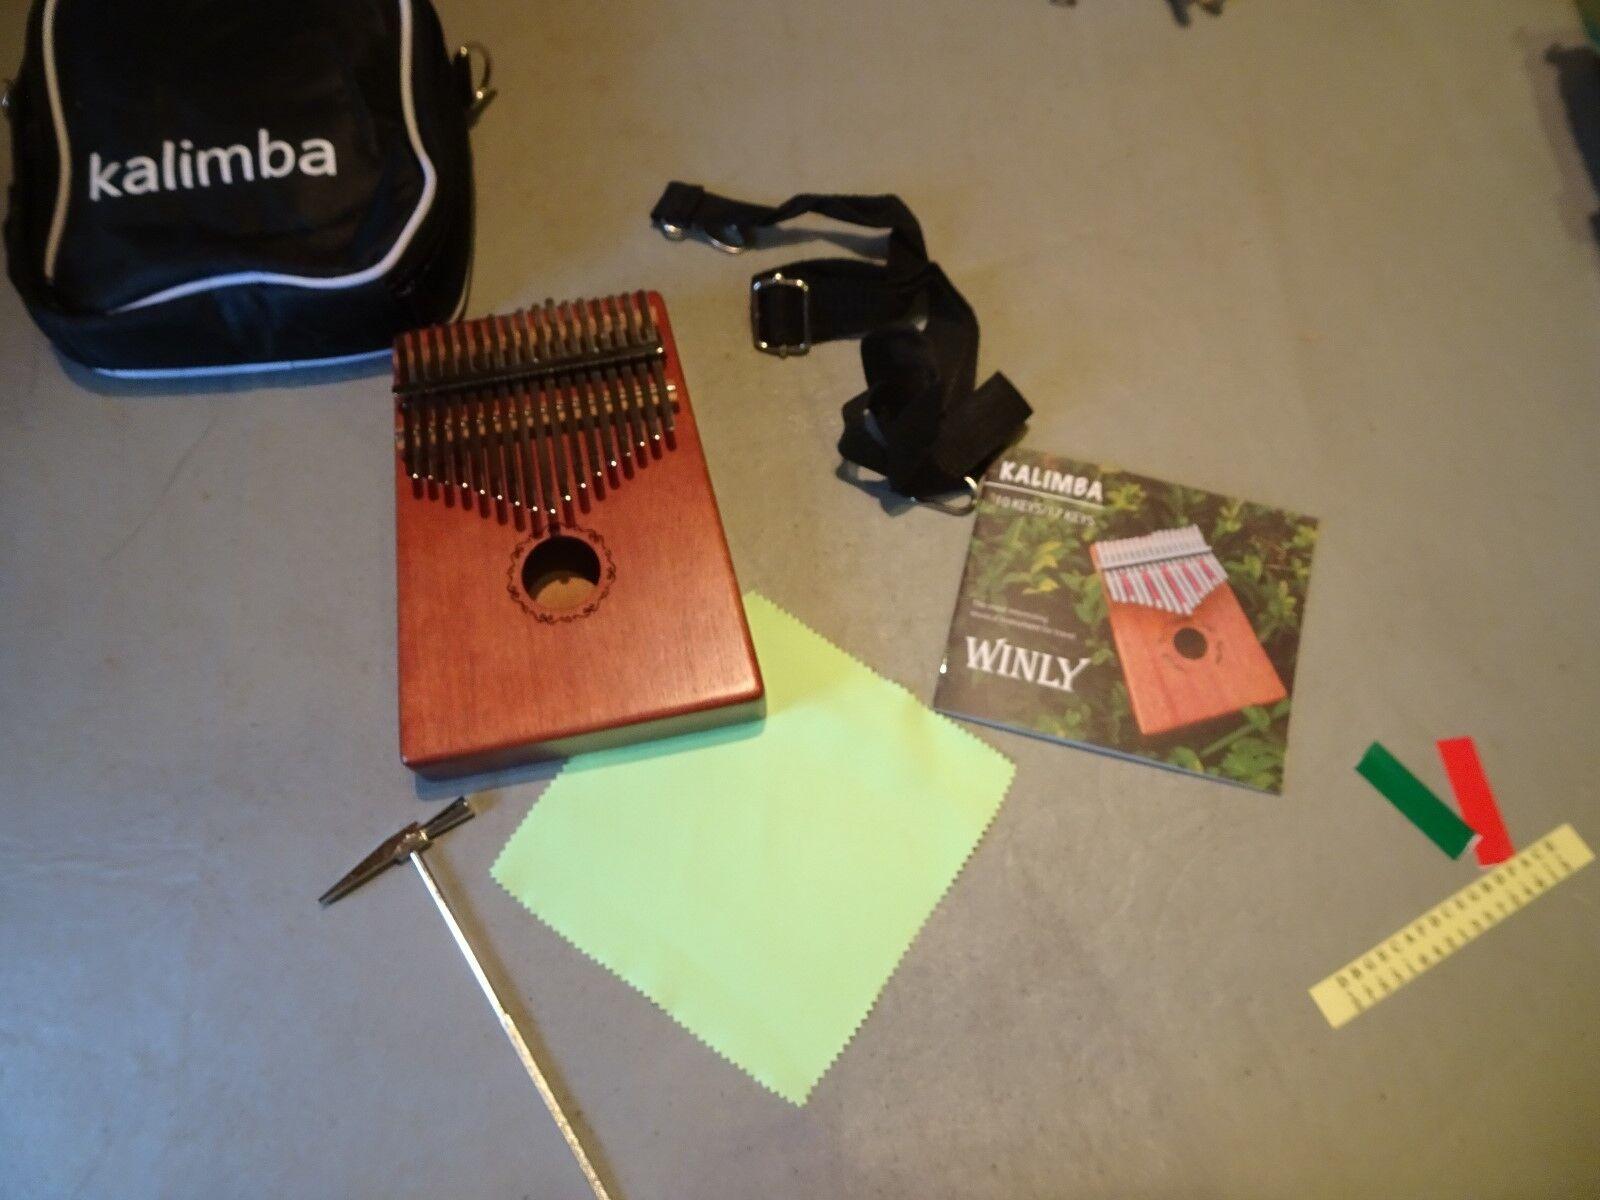 Daumenklavier Kalimba Karimba Instrument 17 Schlüssel solid Finger Klavier NEU